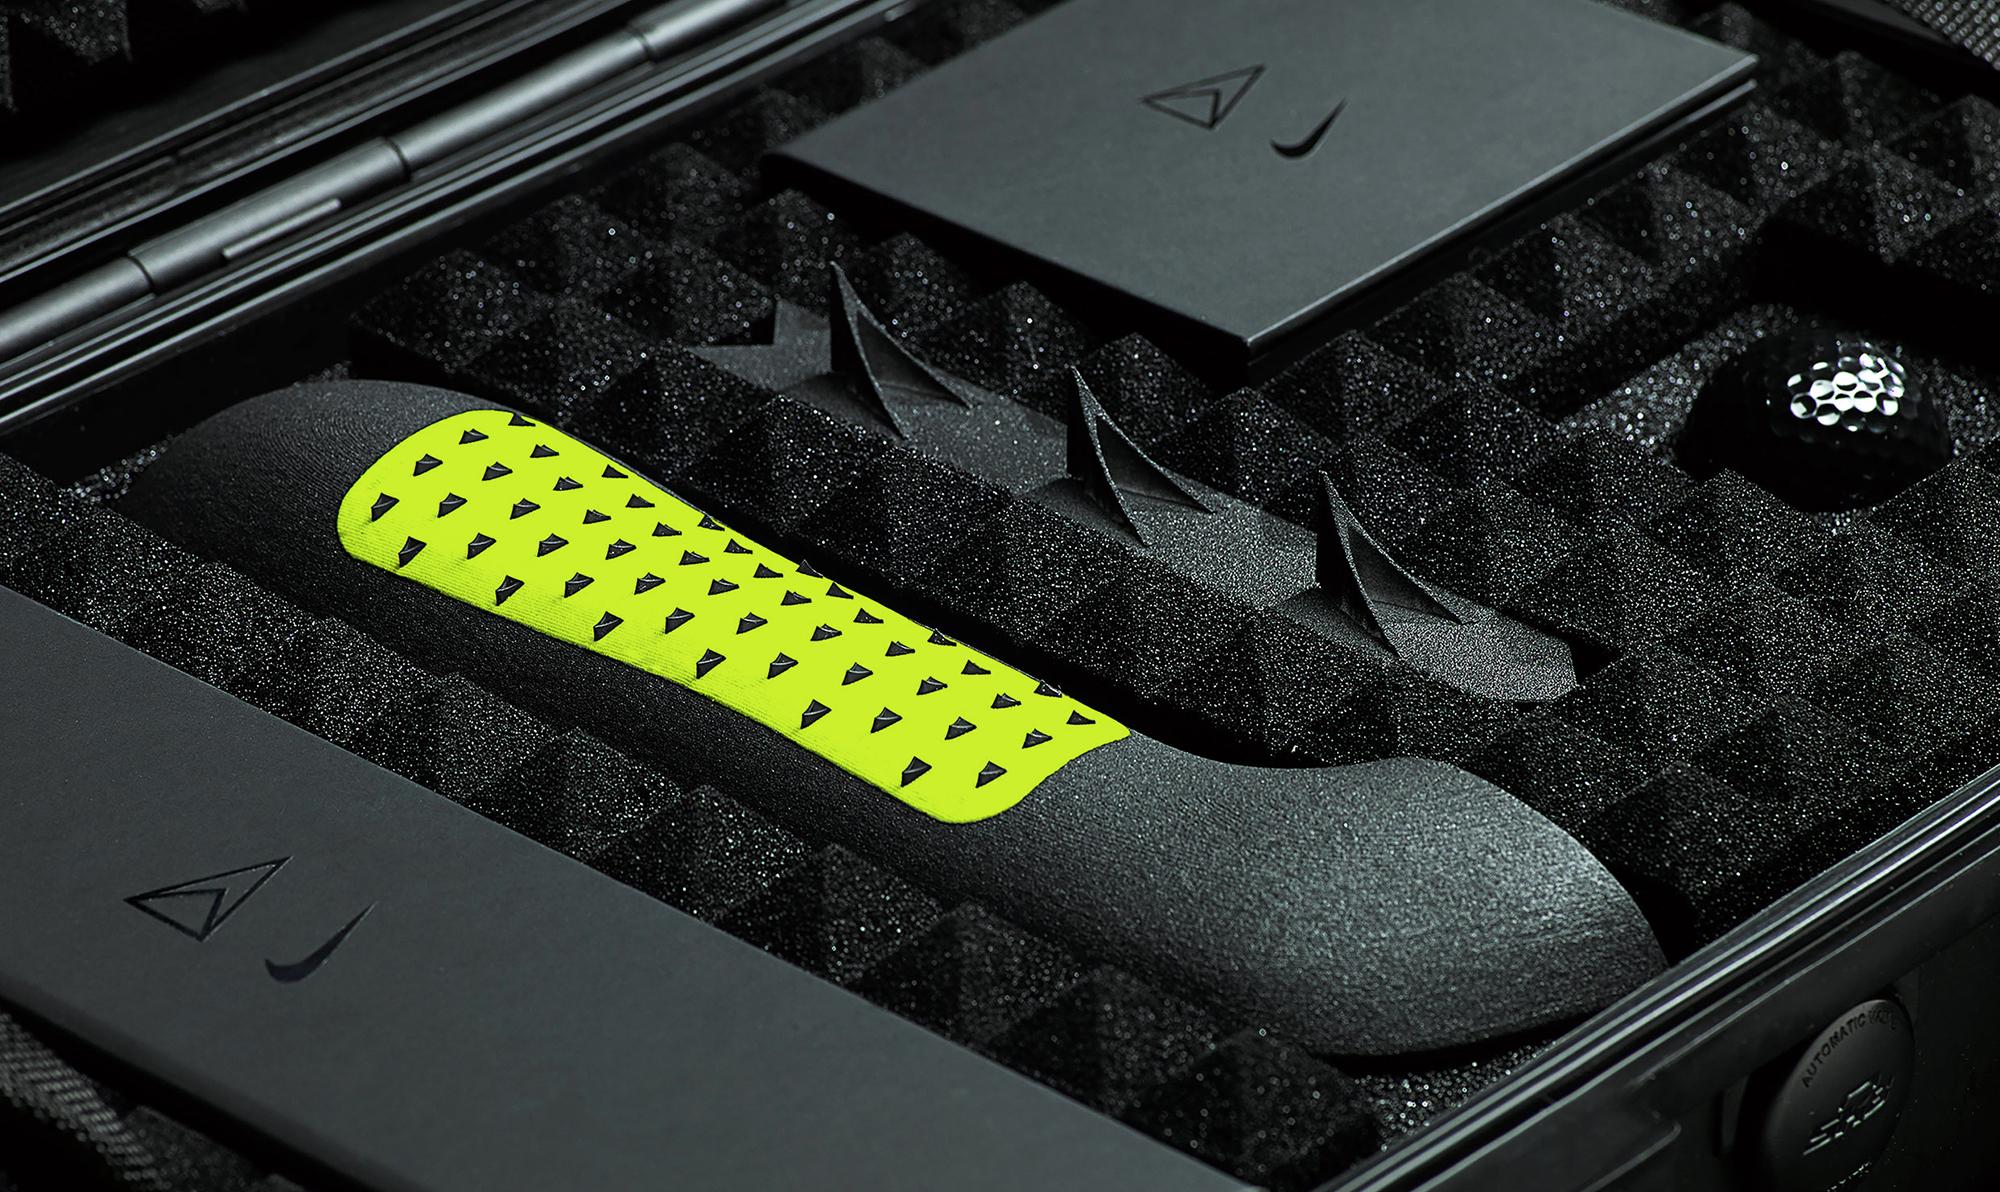 03_Ryan_Bubion_Nike_Innovation_Gallery